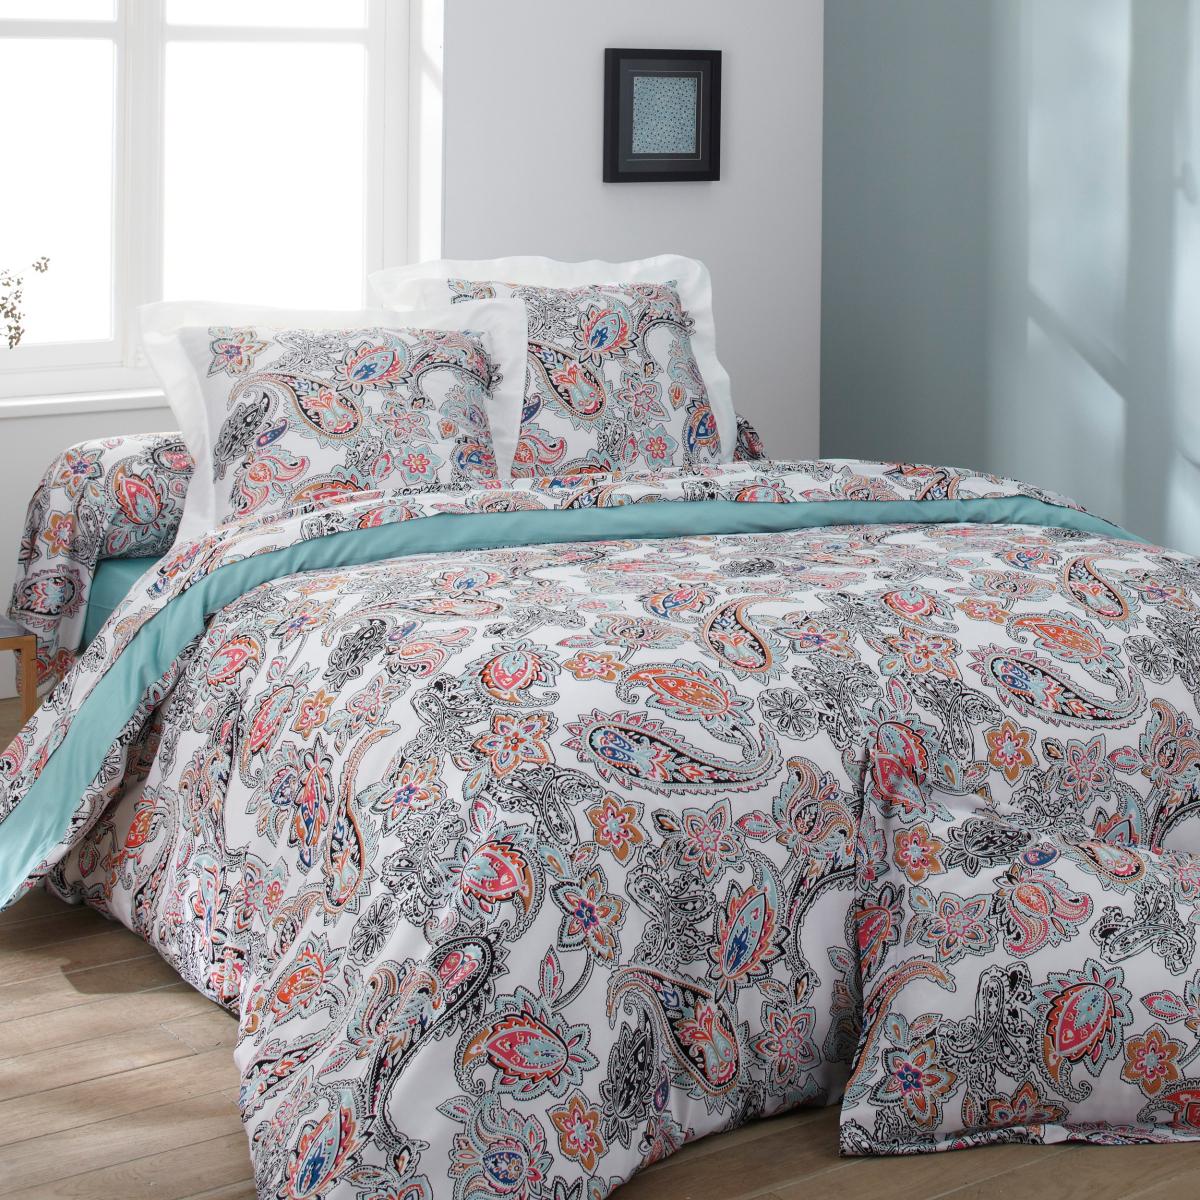 parure drap taj mahal linge de lit de qualit. Black Bedroom Furniture Sets. Home Design Ideas